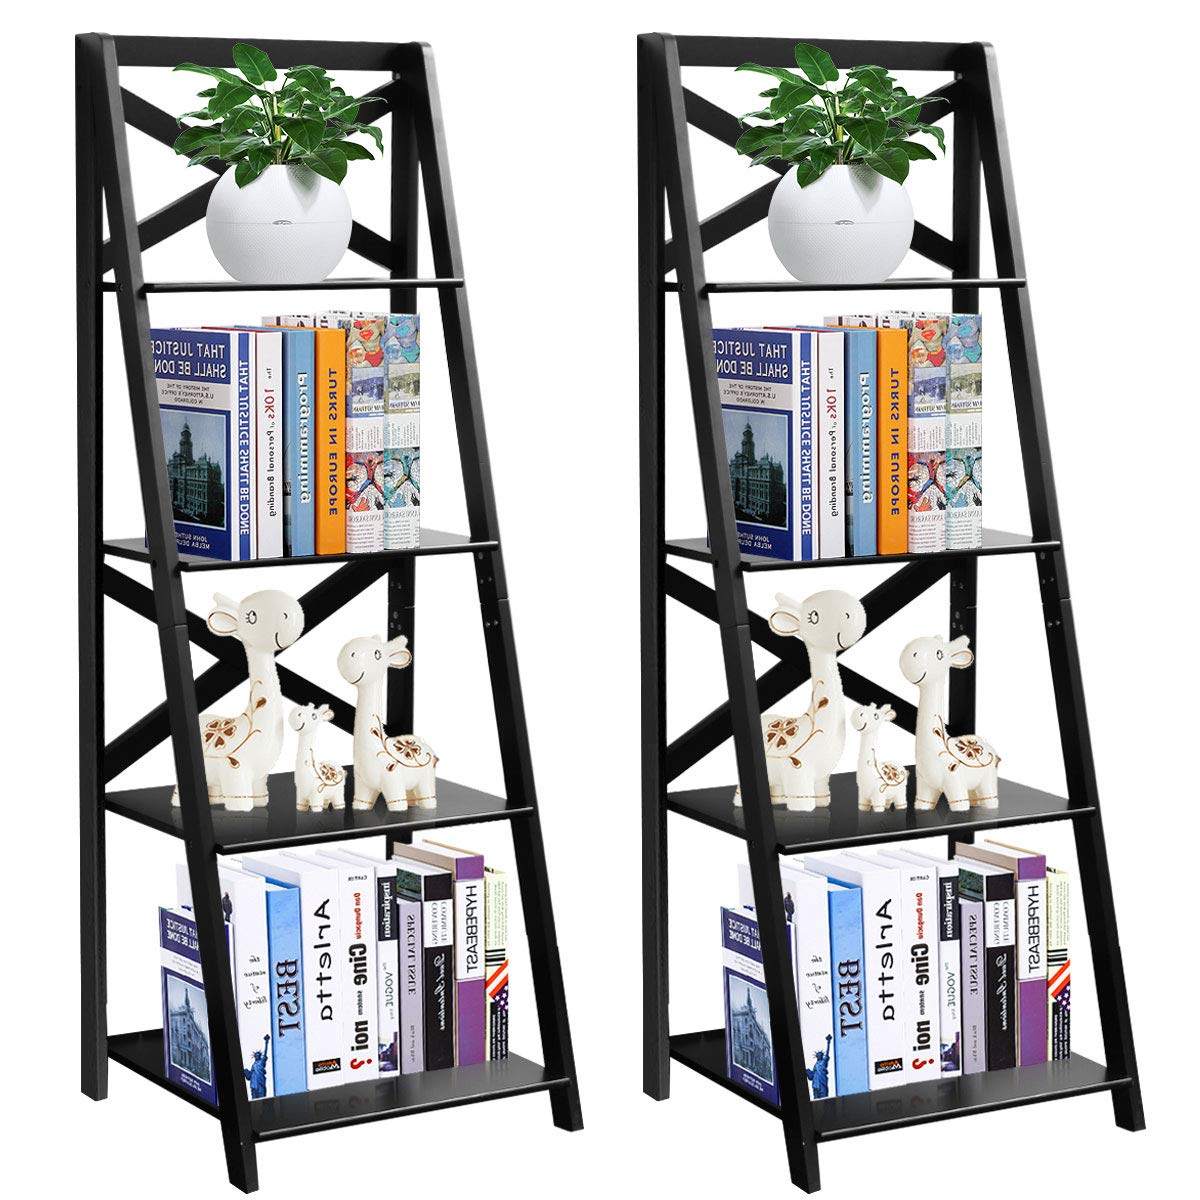 Tangkula 4-Tier Ladder Shelf Bookcase Leaning Free Standing Wooden Frame Decor Bookshelf Storage Flower Shelf Plant Display Shelf for Home Office (2) ... by Tangkula